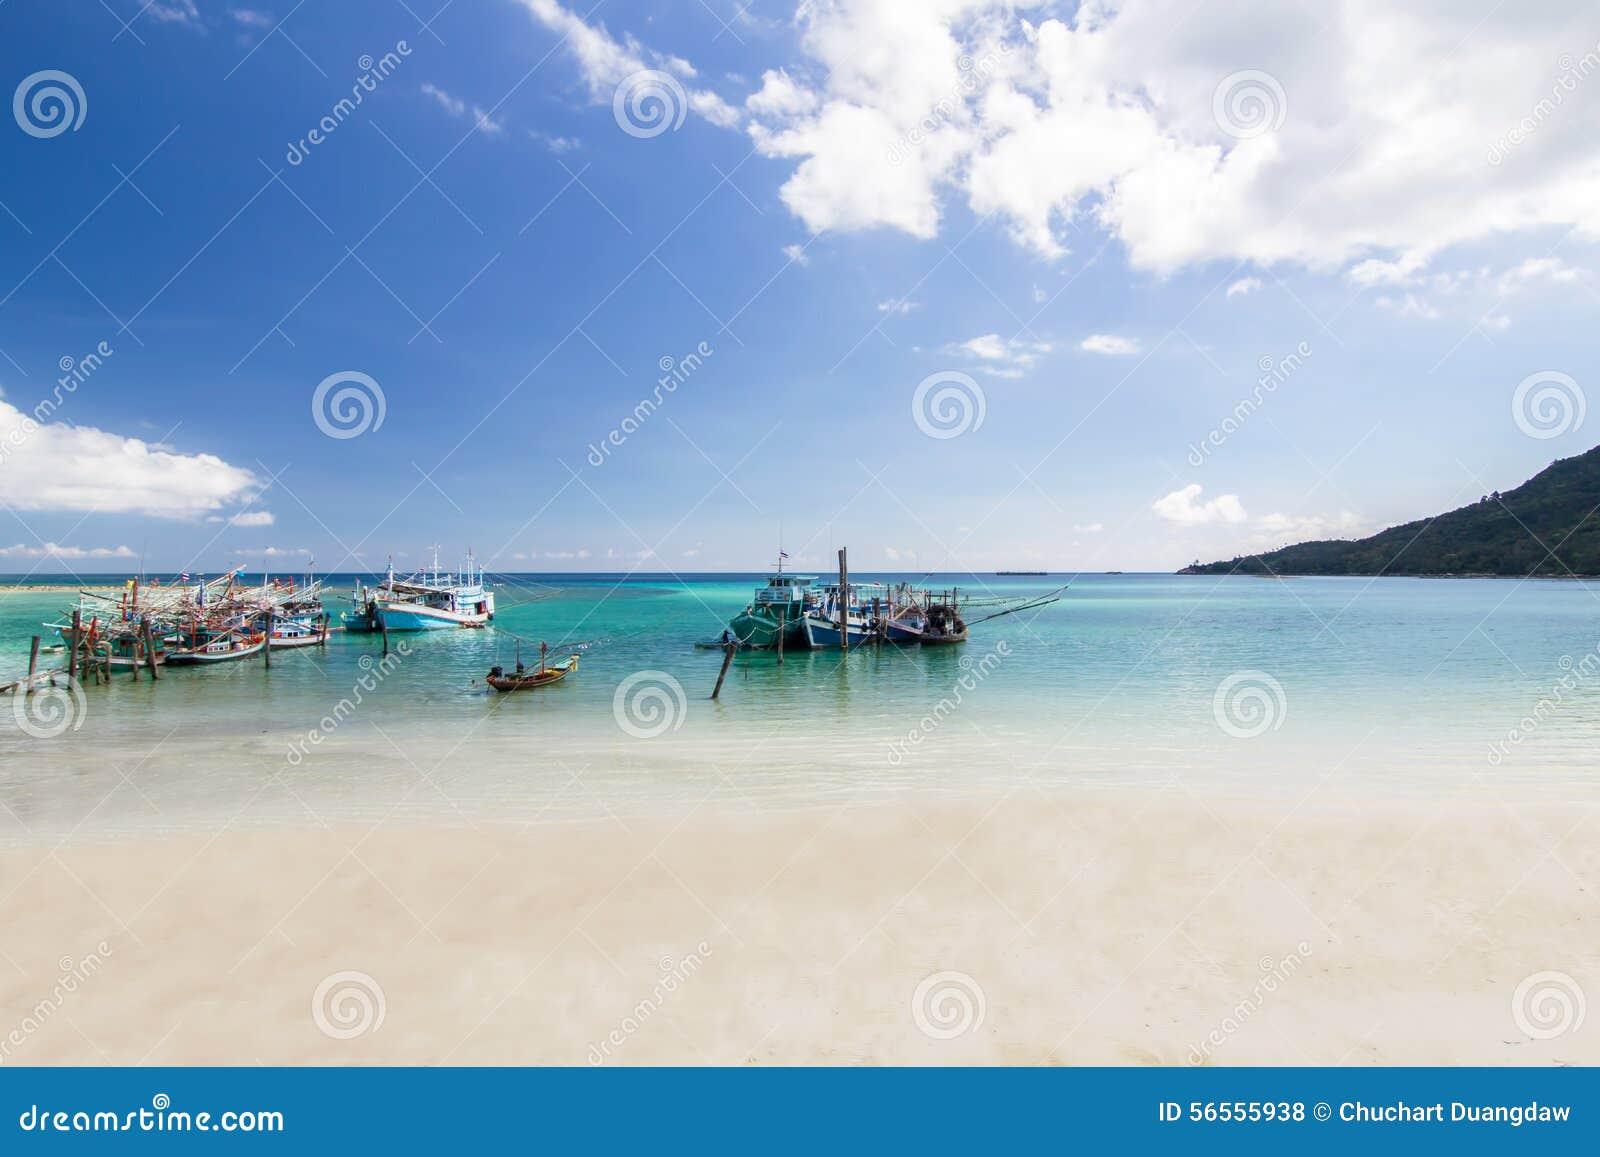 Download Με μακριά ουρά βάρκα και η παραλία και ο μπλε ουρανός Koh Phangan, Sur Στοκ Εικόνες - εικόνα από ηλιόλουστος, παράδεισος: 56555938